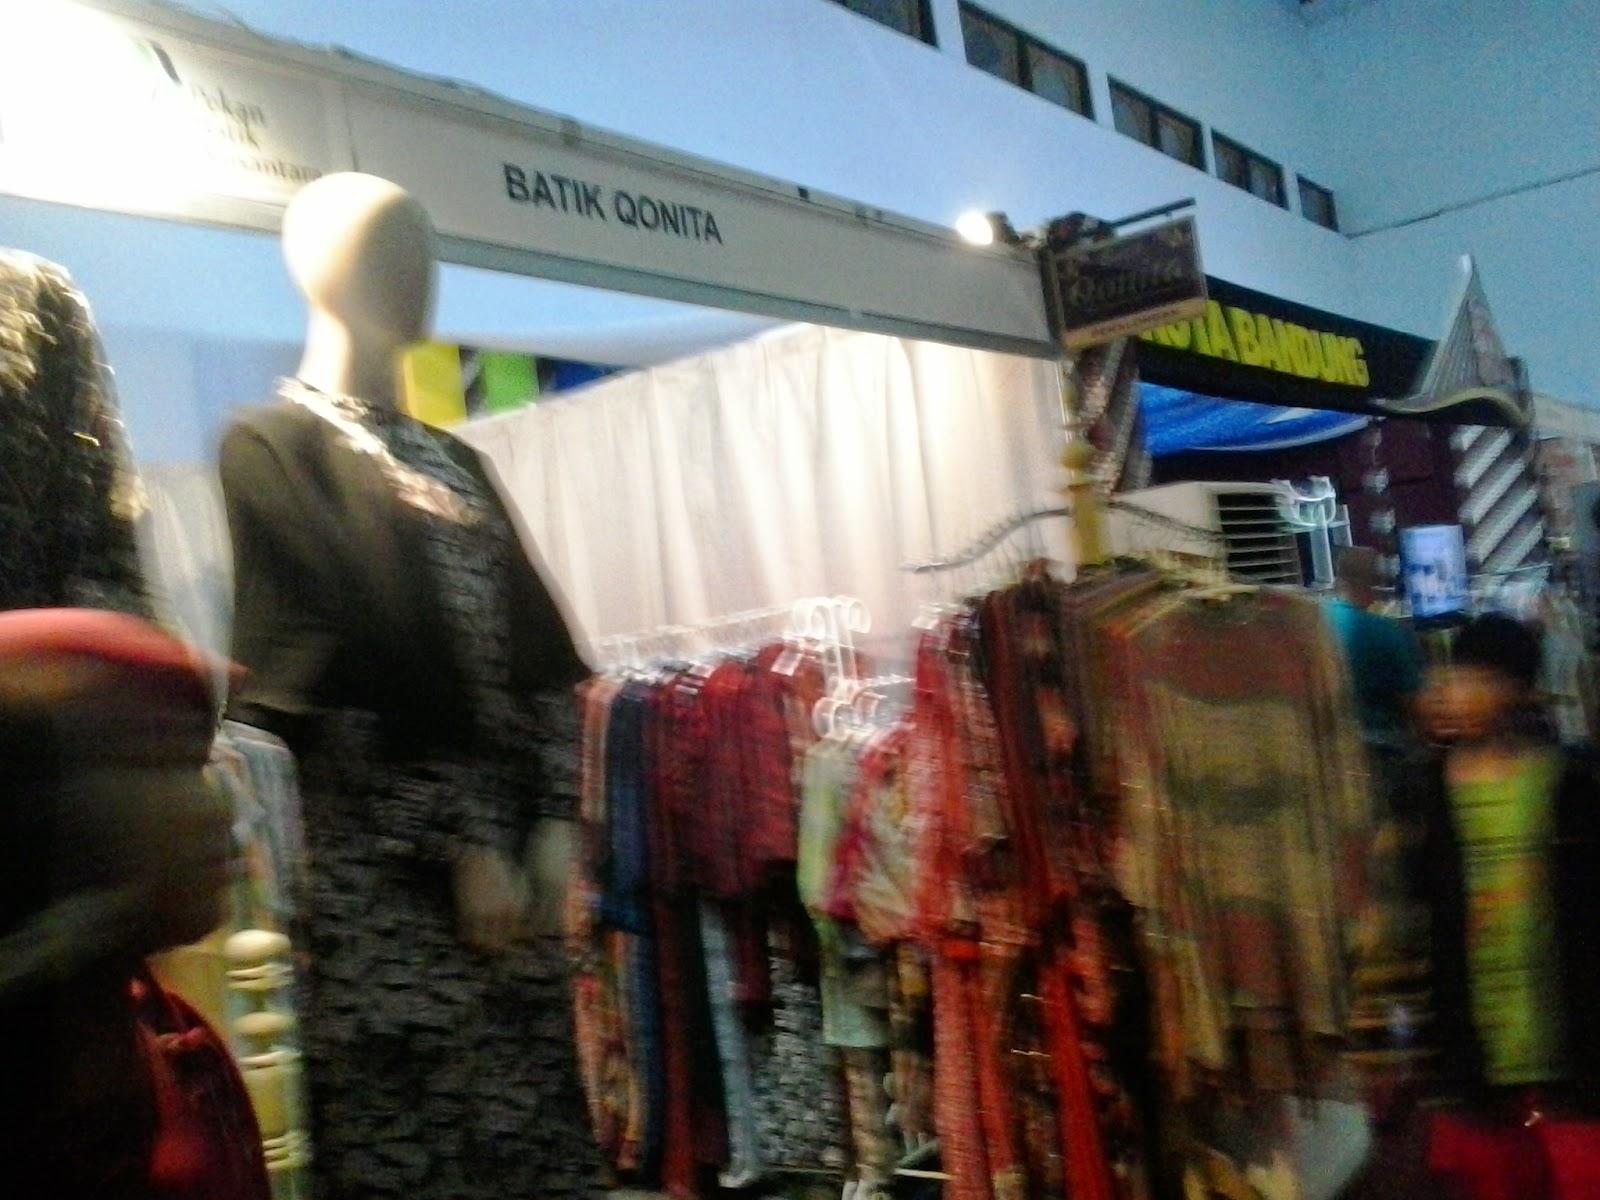 Pekan Batik Nusantara Harapan Pendongkrak Roda Perekonomian Sekaligus Budaya Lingkungan Bersih